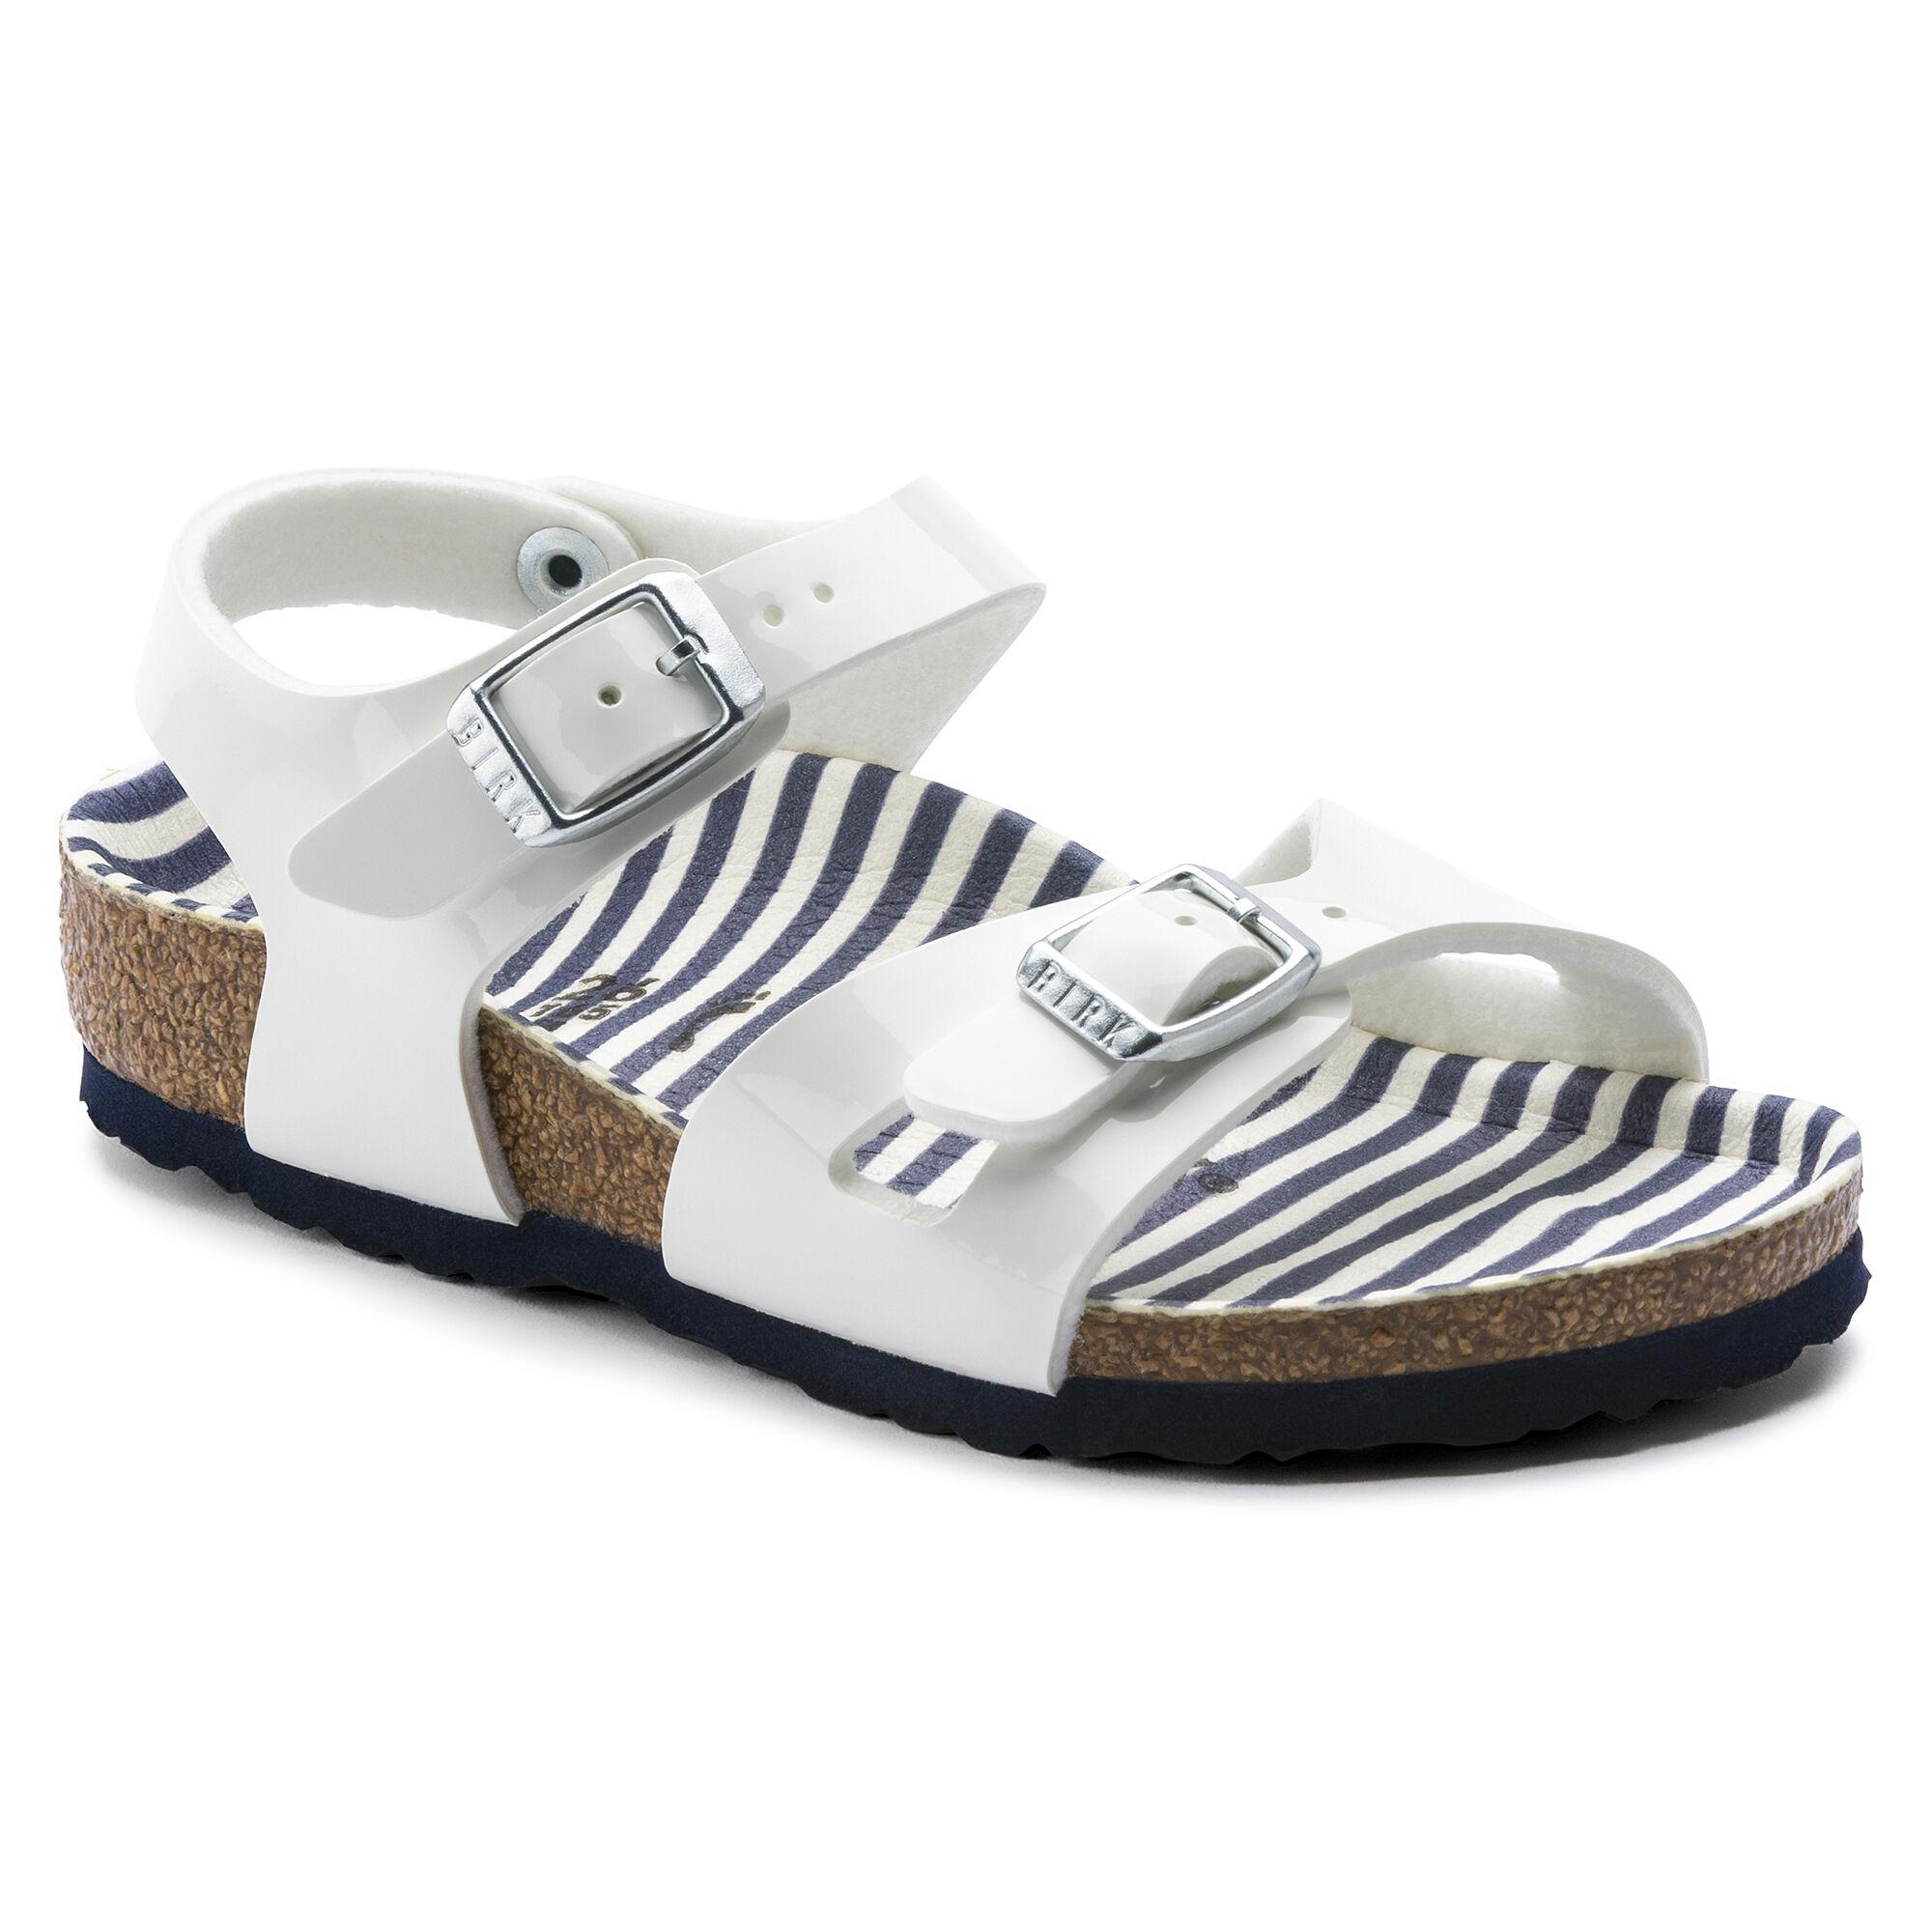 Sandals For Girls Summer Dance Shoes Princess European Size 25~40 Big Size Top Watermelons Girls